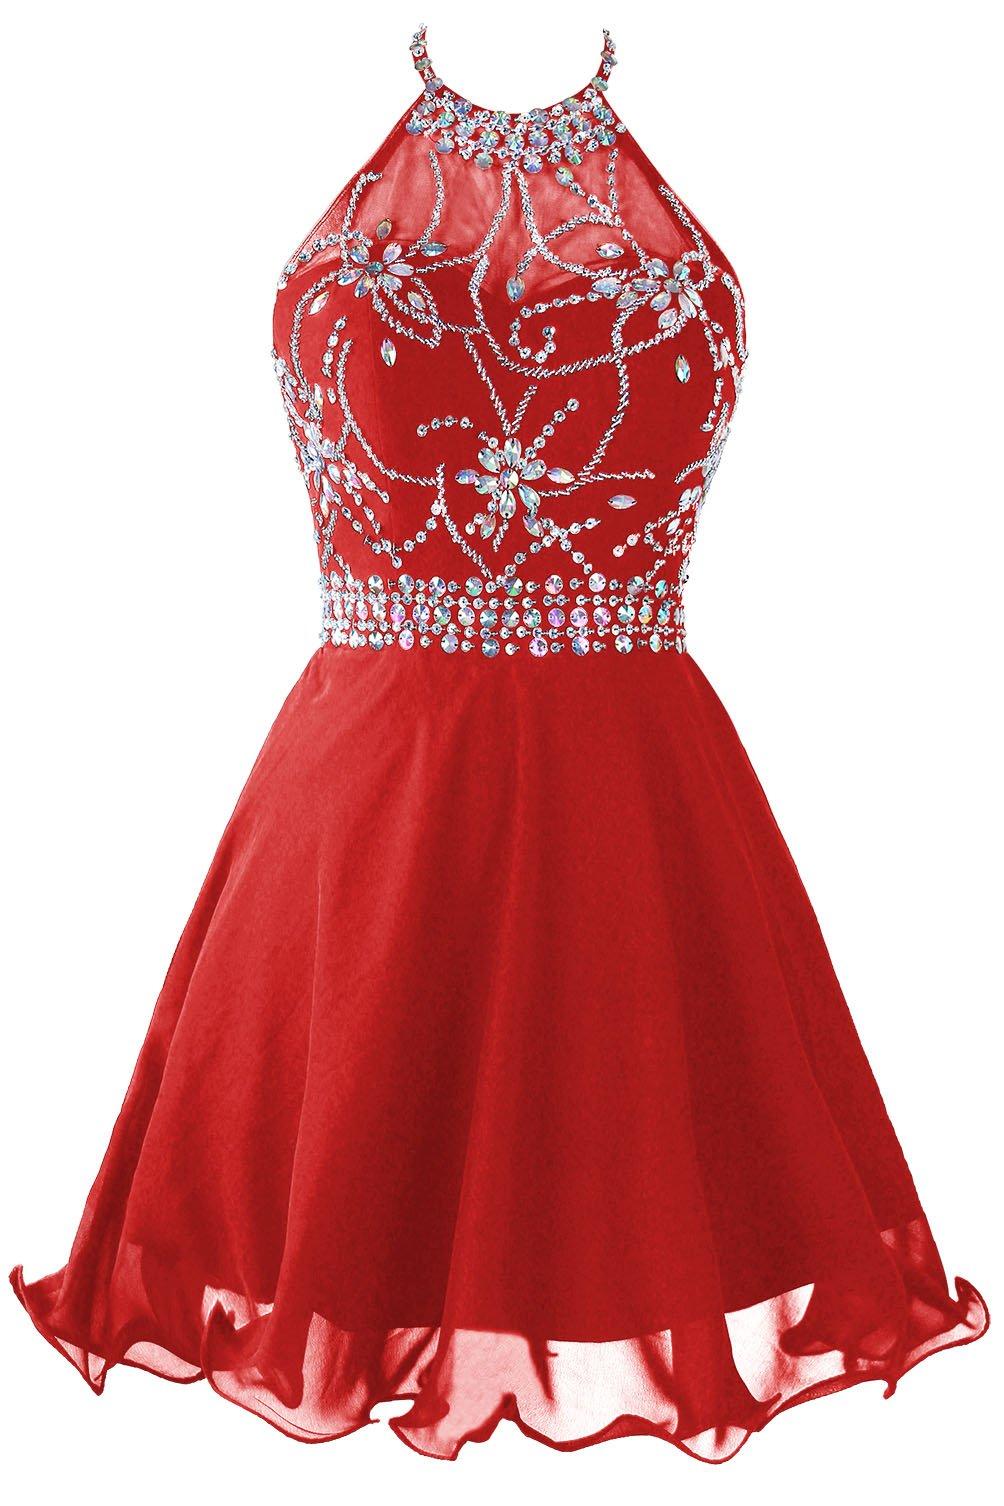 Topdress Womens Short Beaded Prom Dress Halter Homecoming Dress Backless